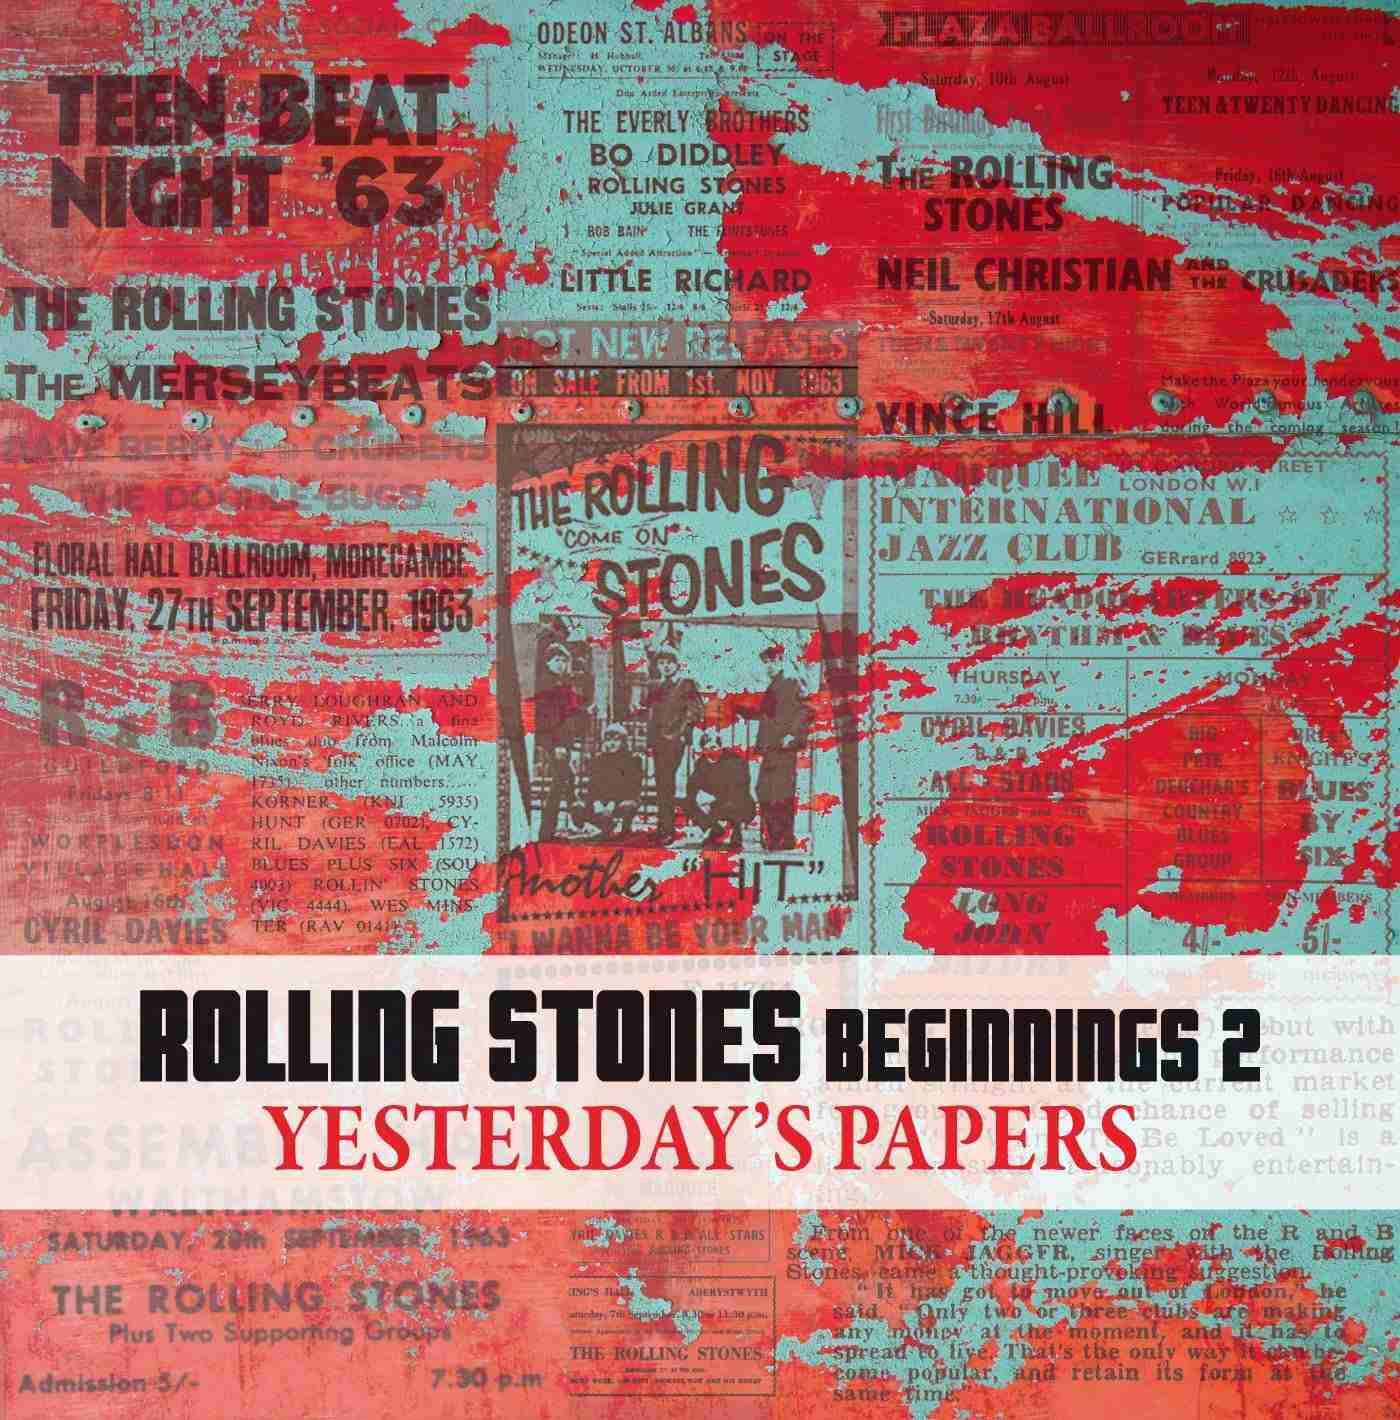 Rolling Stones Beginnings Vol 2